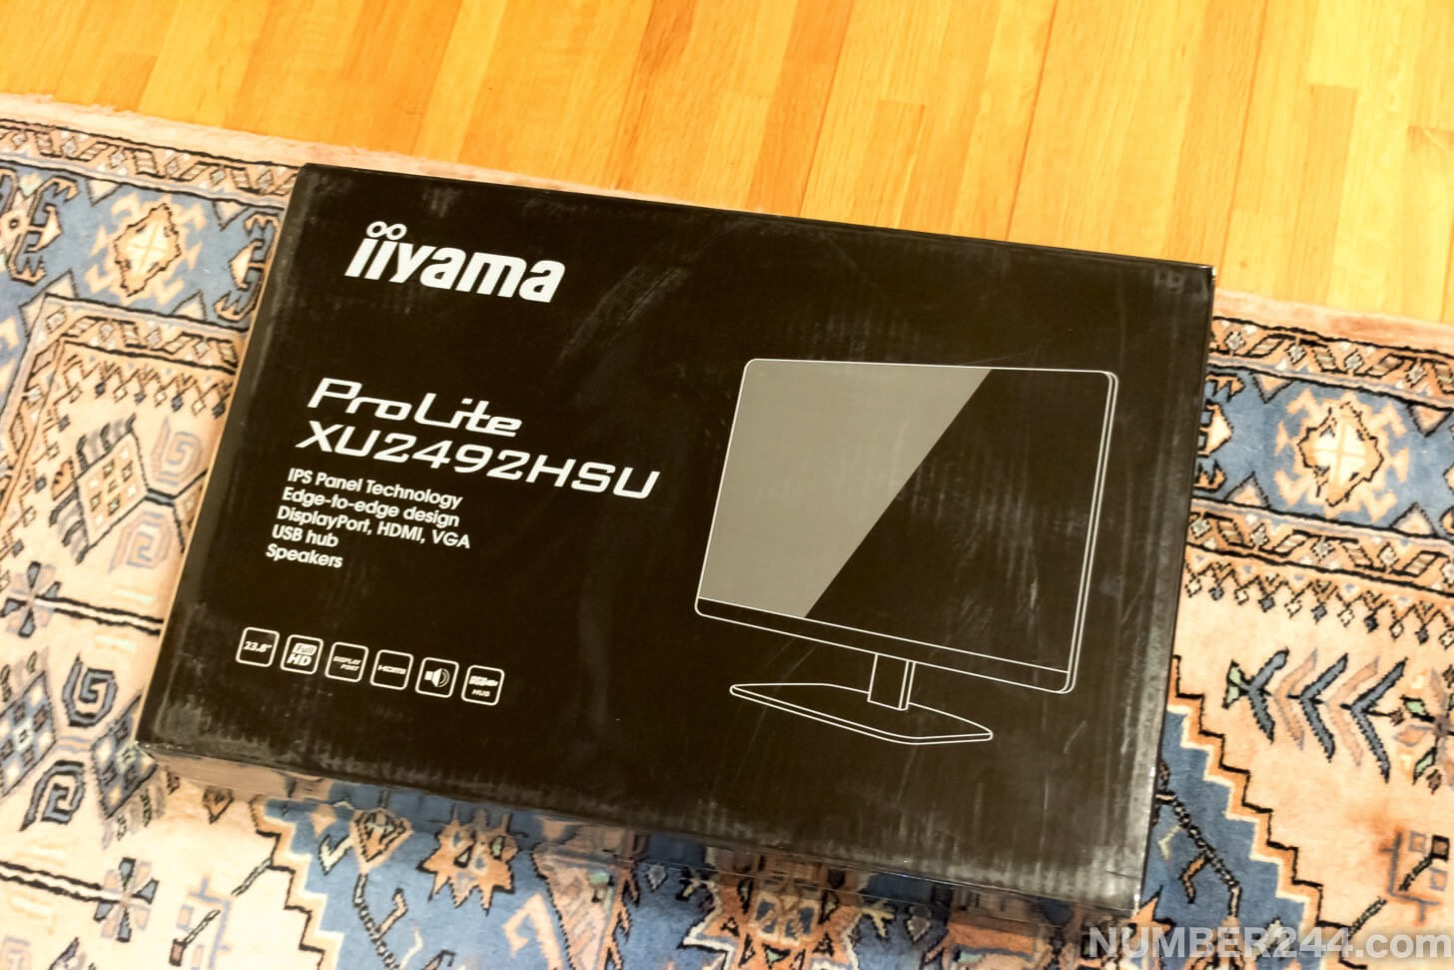 Iiyama XU2492HSU B1 20